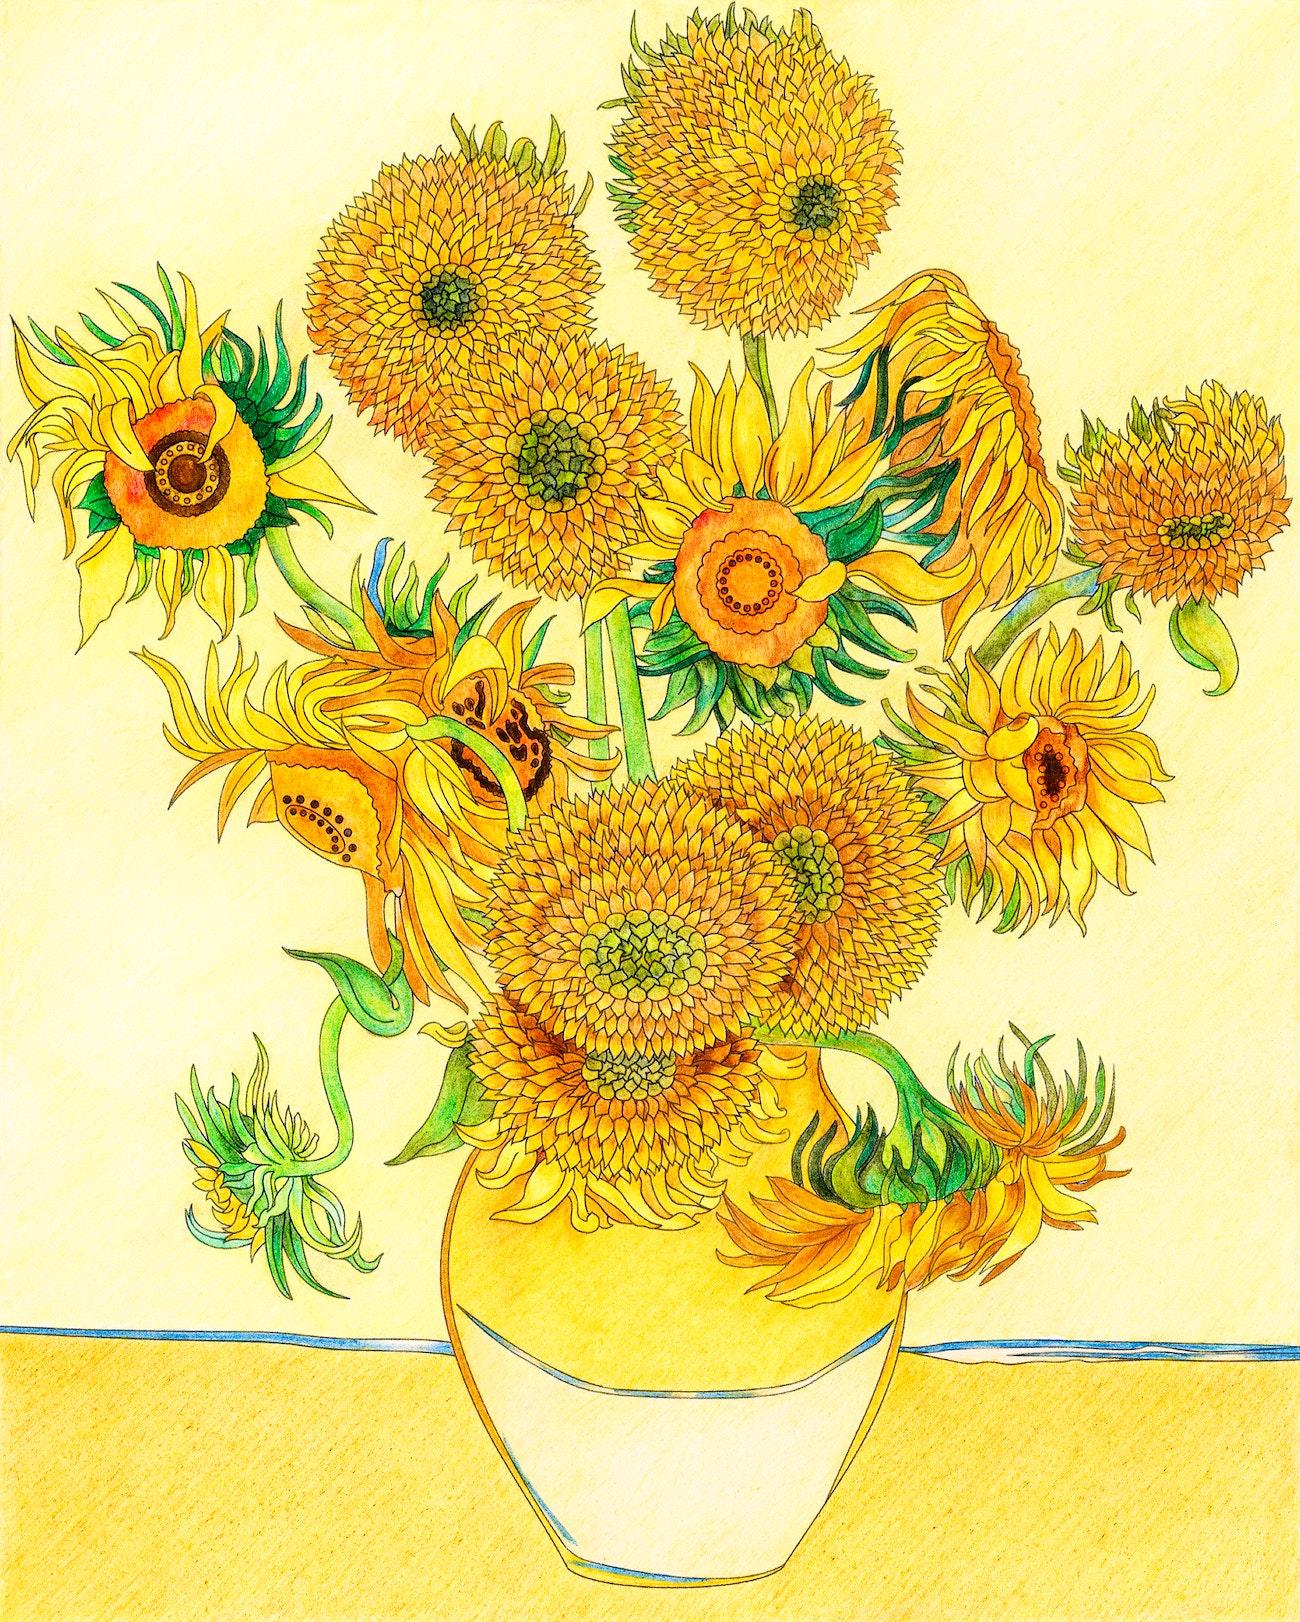 Van Gogh Colouring Pages - Van Gogh Museum | 1622x1300